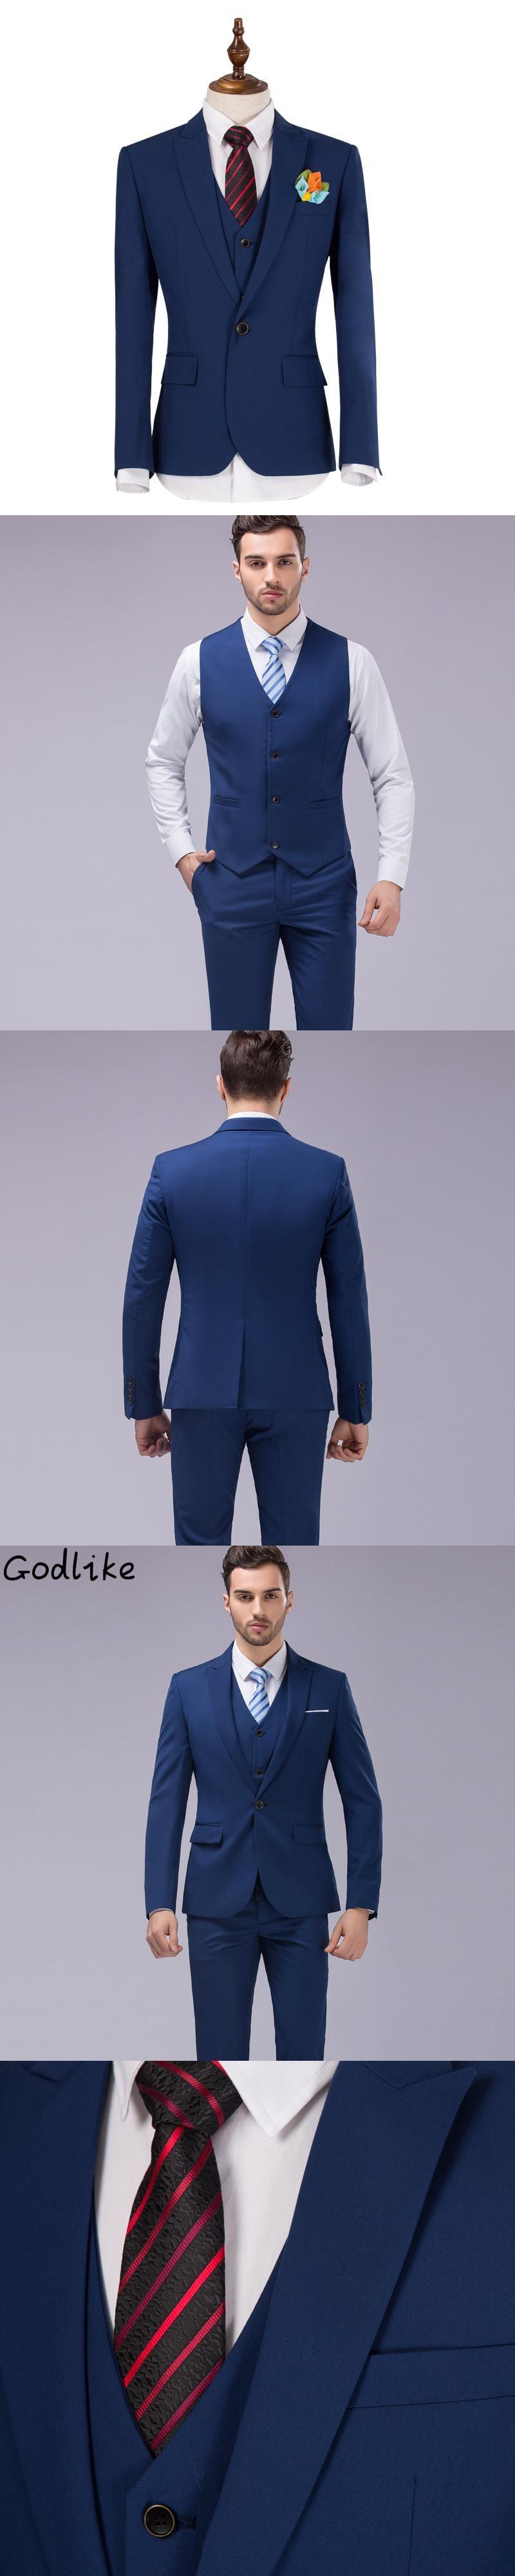 Godlikesuit vest pants menus best man groom wedding dress